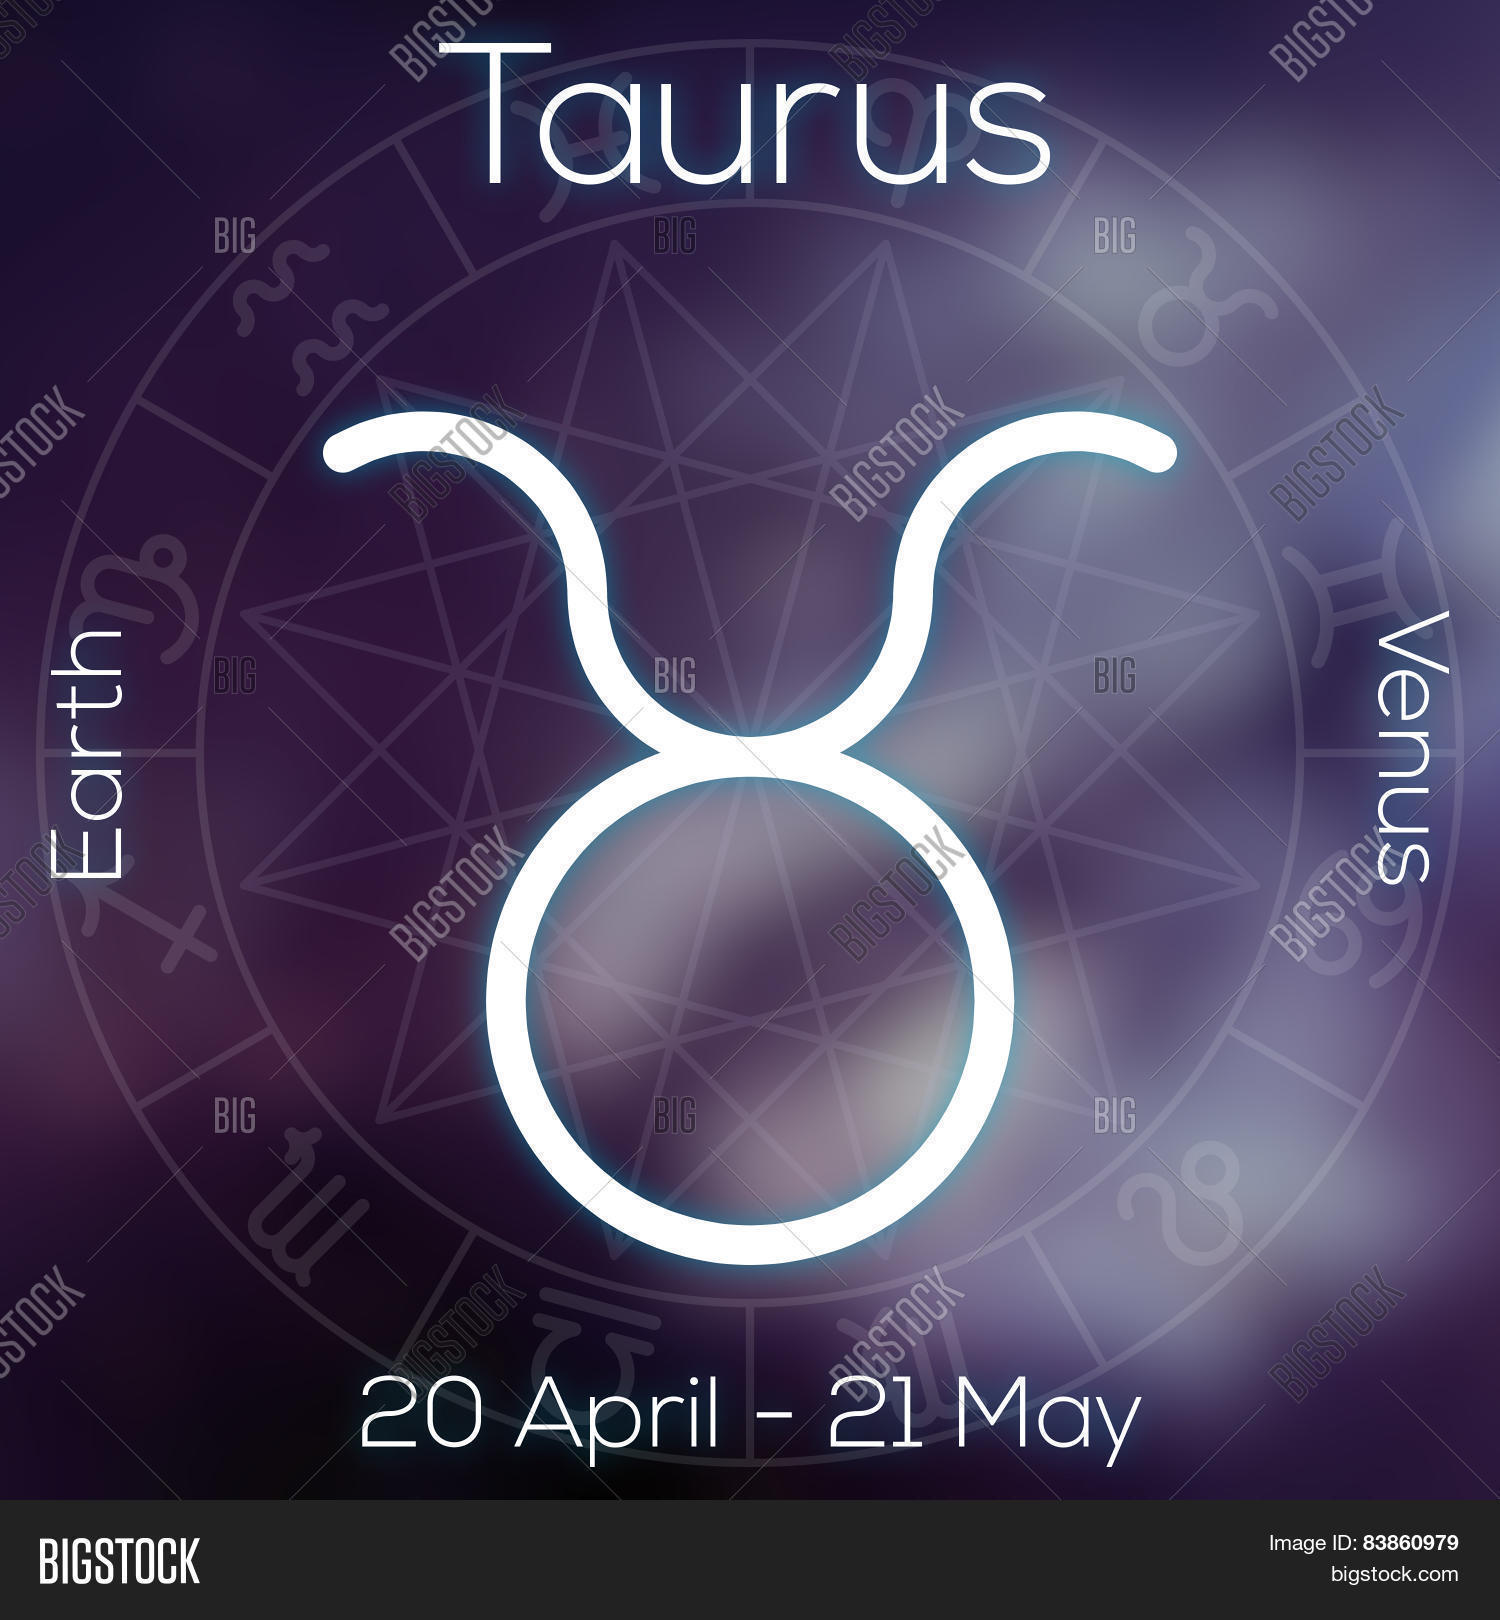 Zodiac Sign Taurus Image Photo Free Trial Bigstock